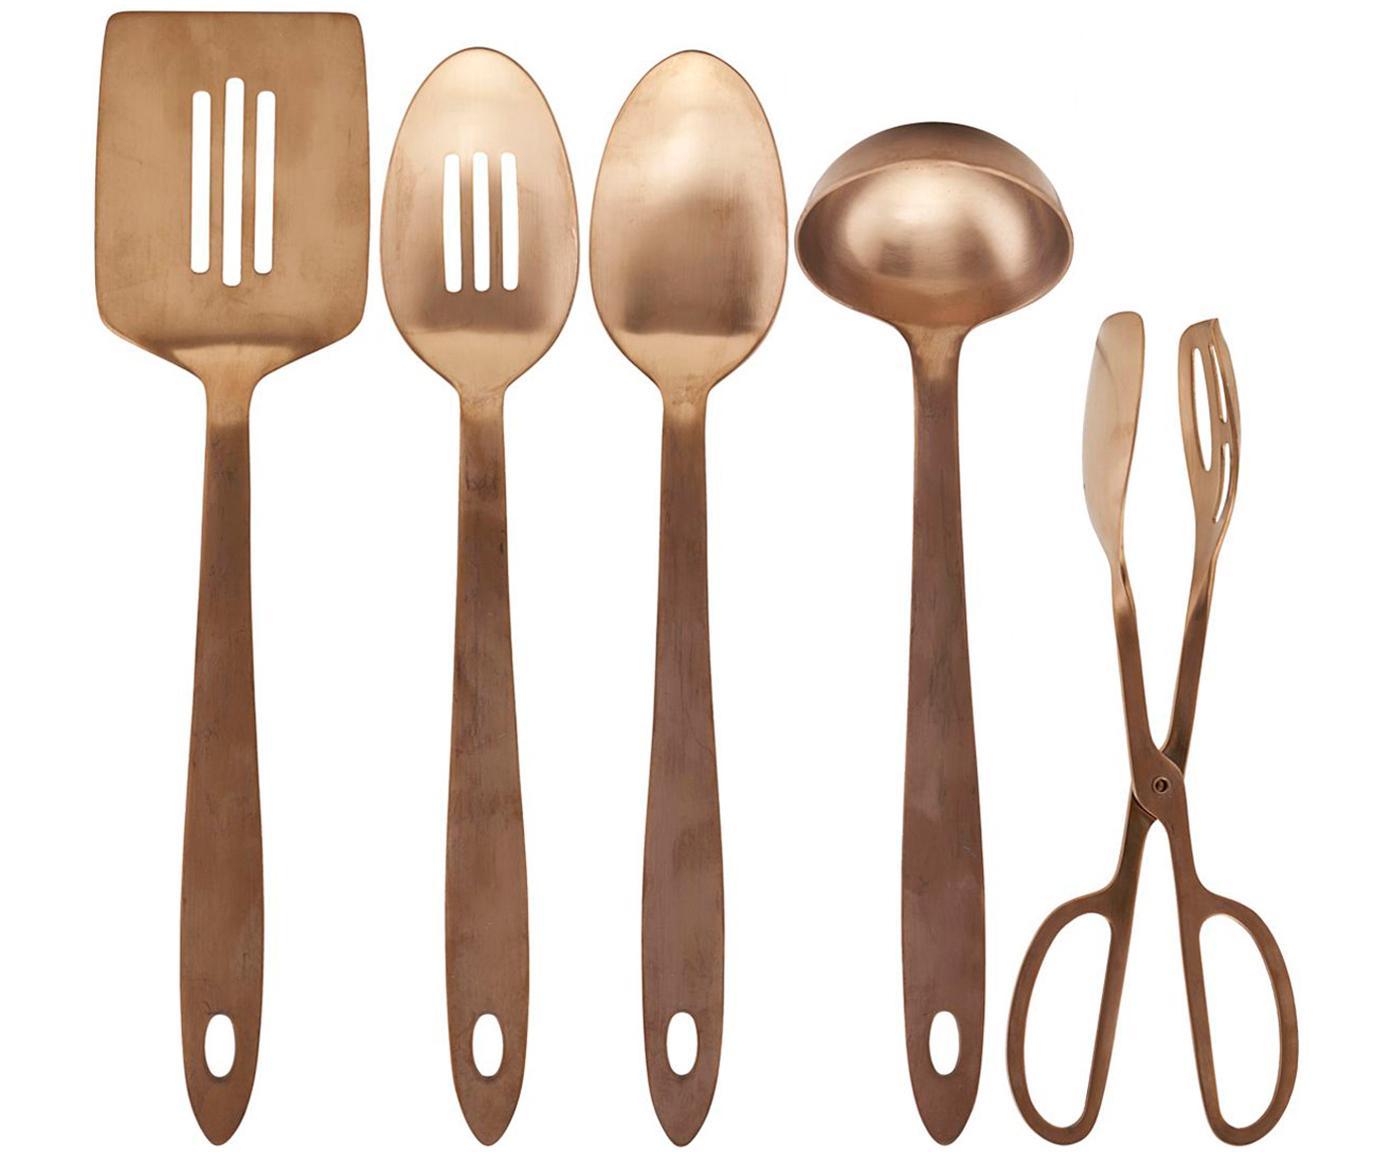 Küchenutensilien Take in Kupfer, 5er-Set, Edelstahl, Kupferfarben, Sondergrößen